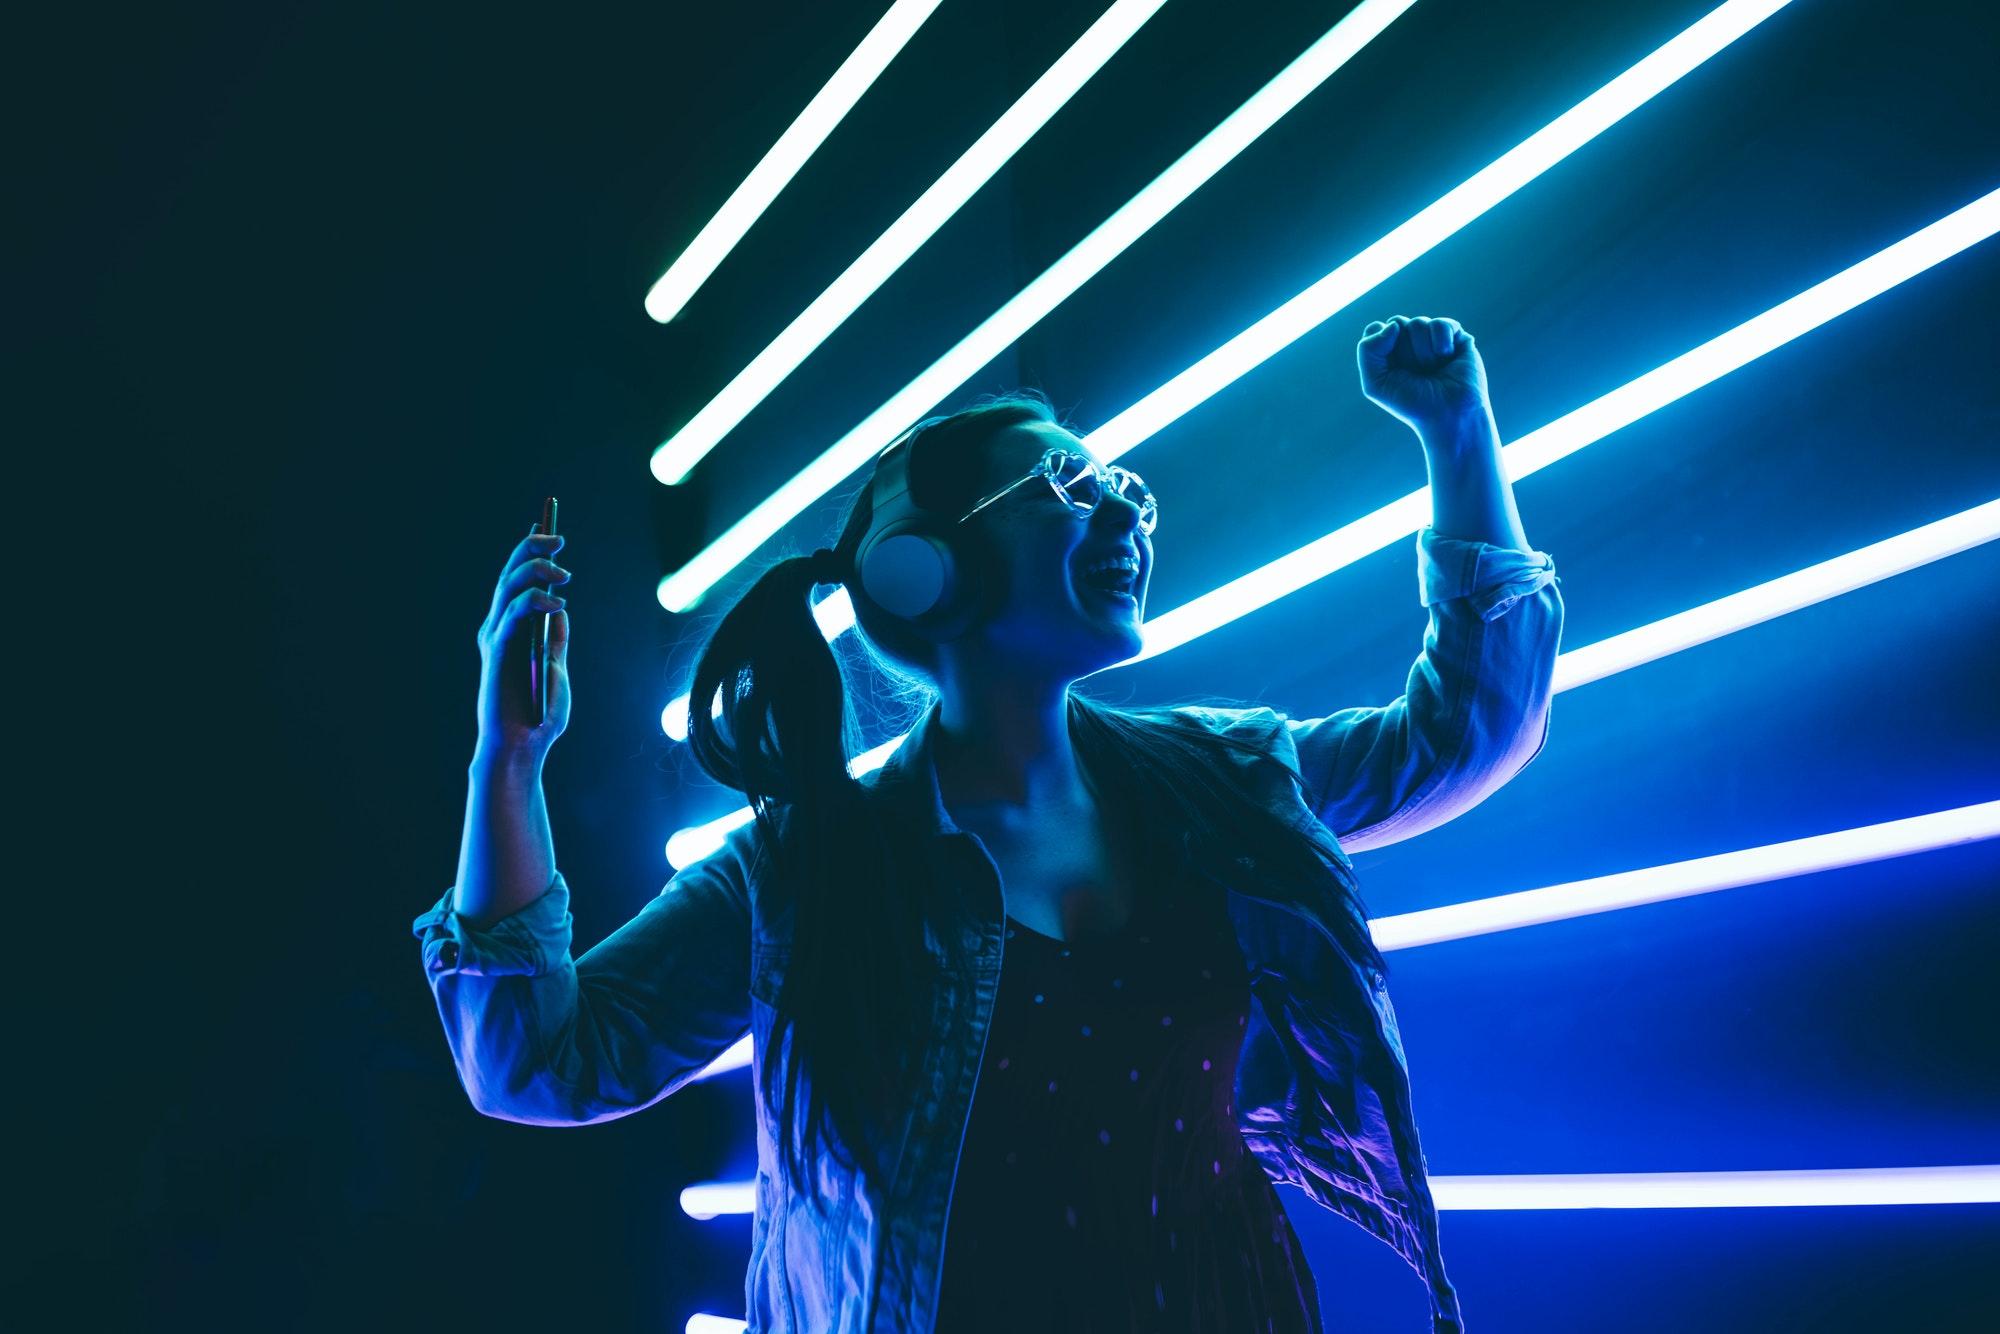 Woman in headphones listening music and dancing in neon light.